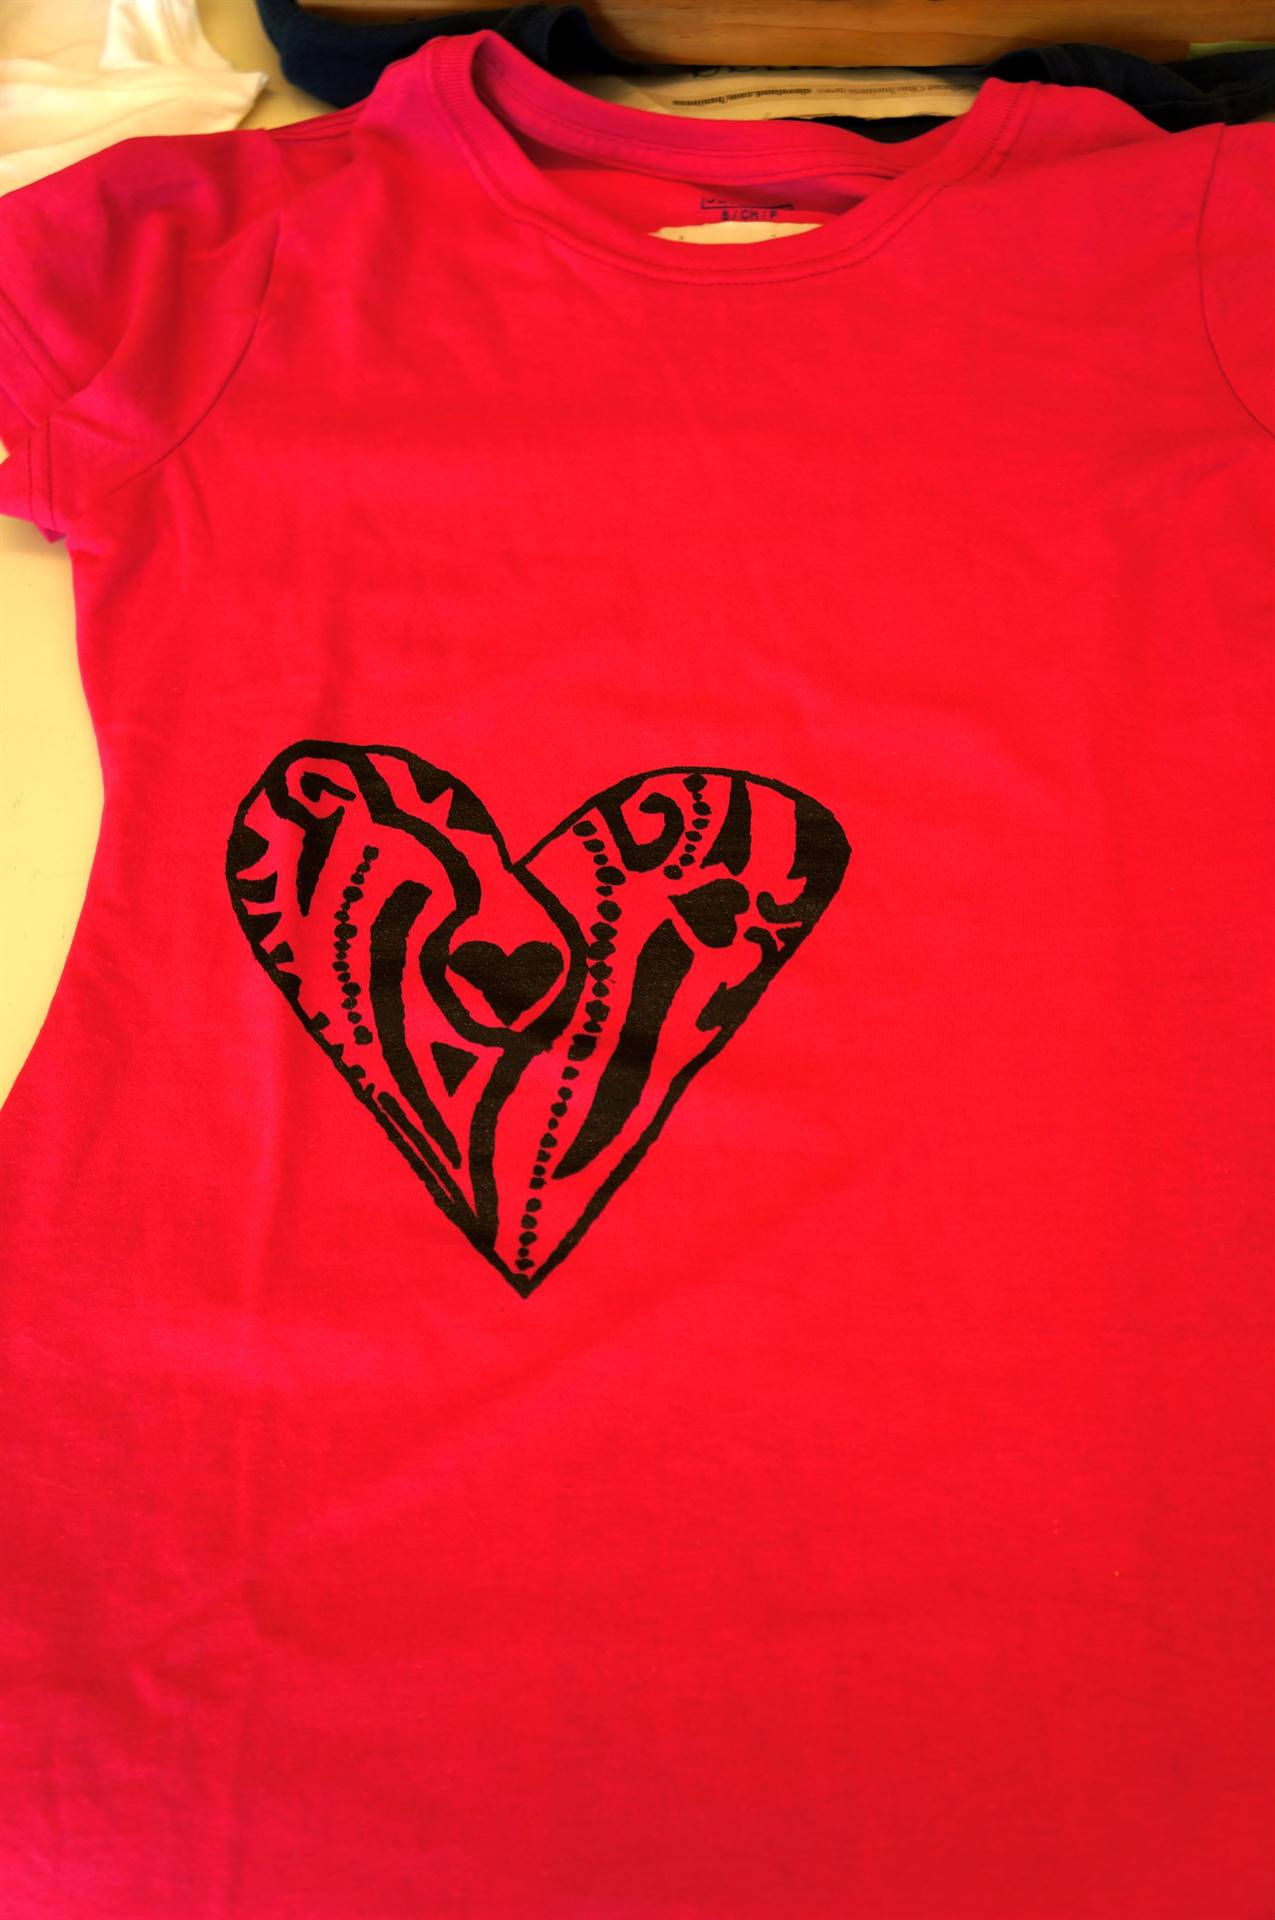 Screen-printed-shirt